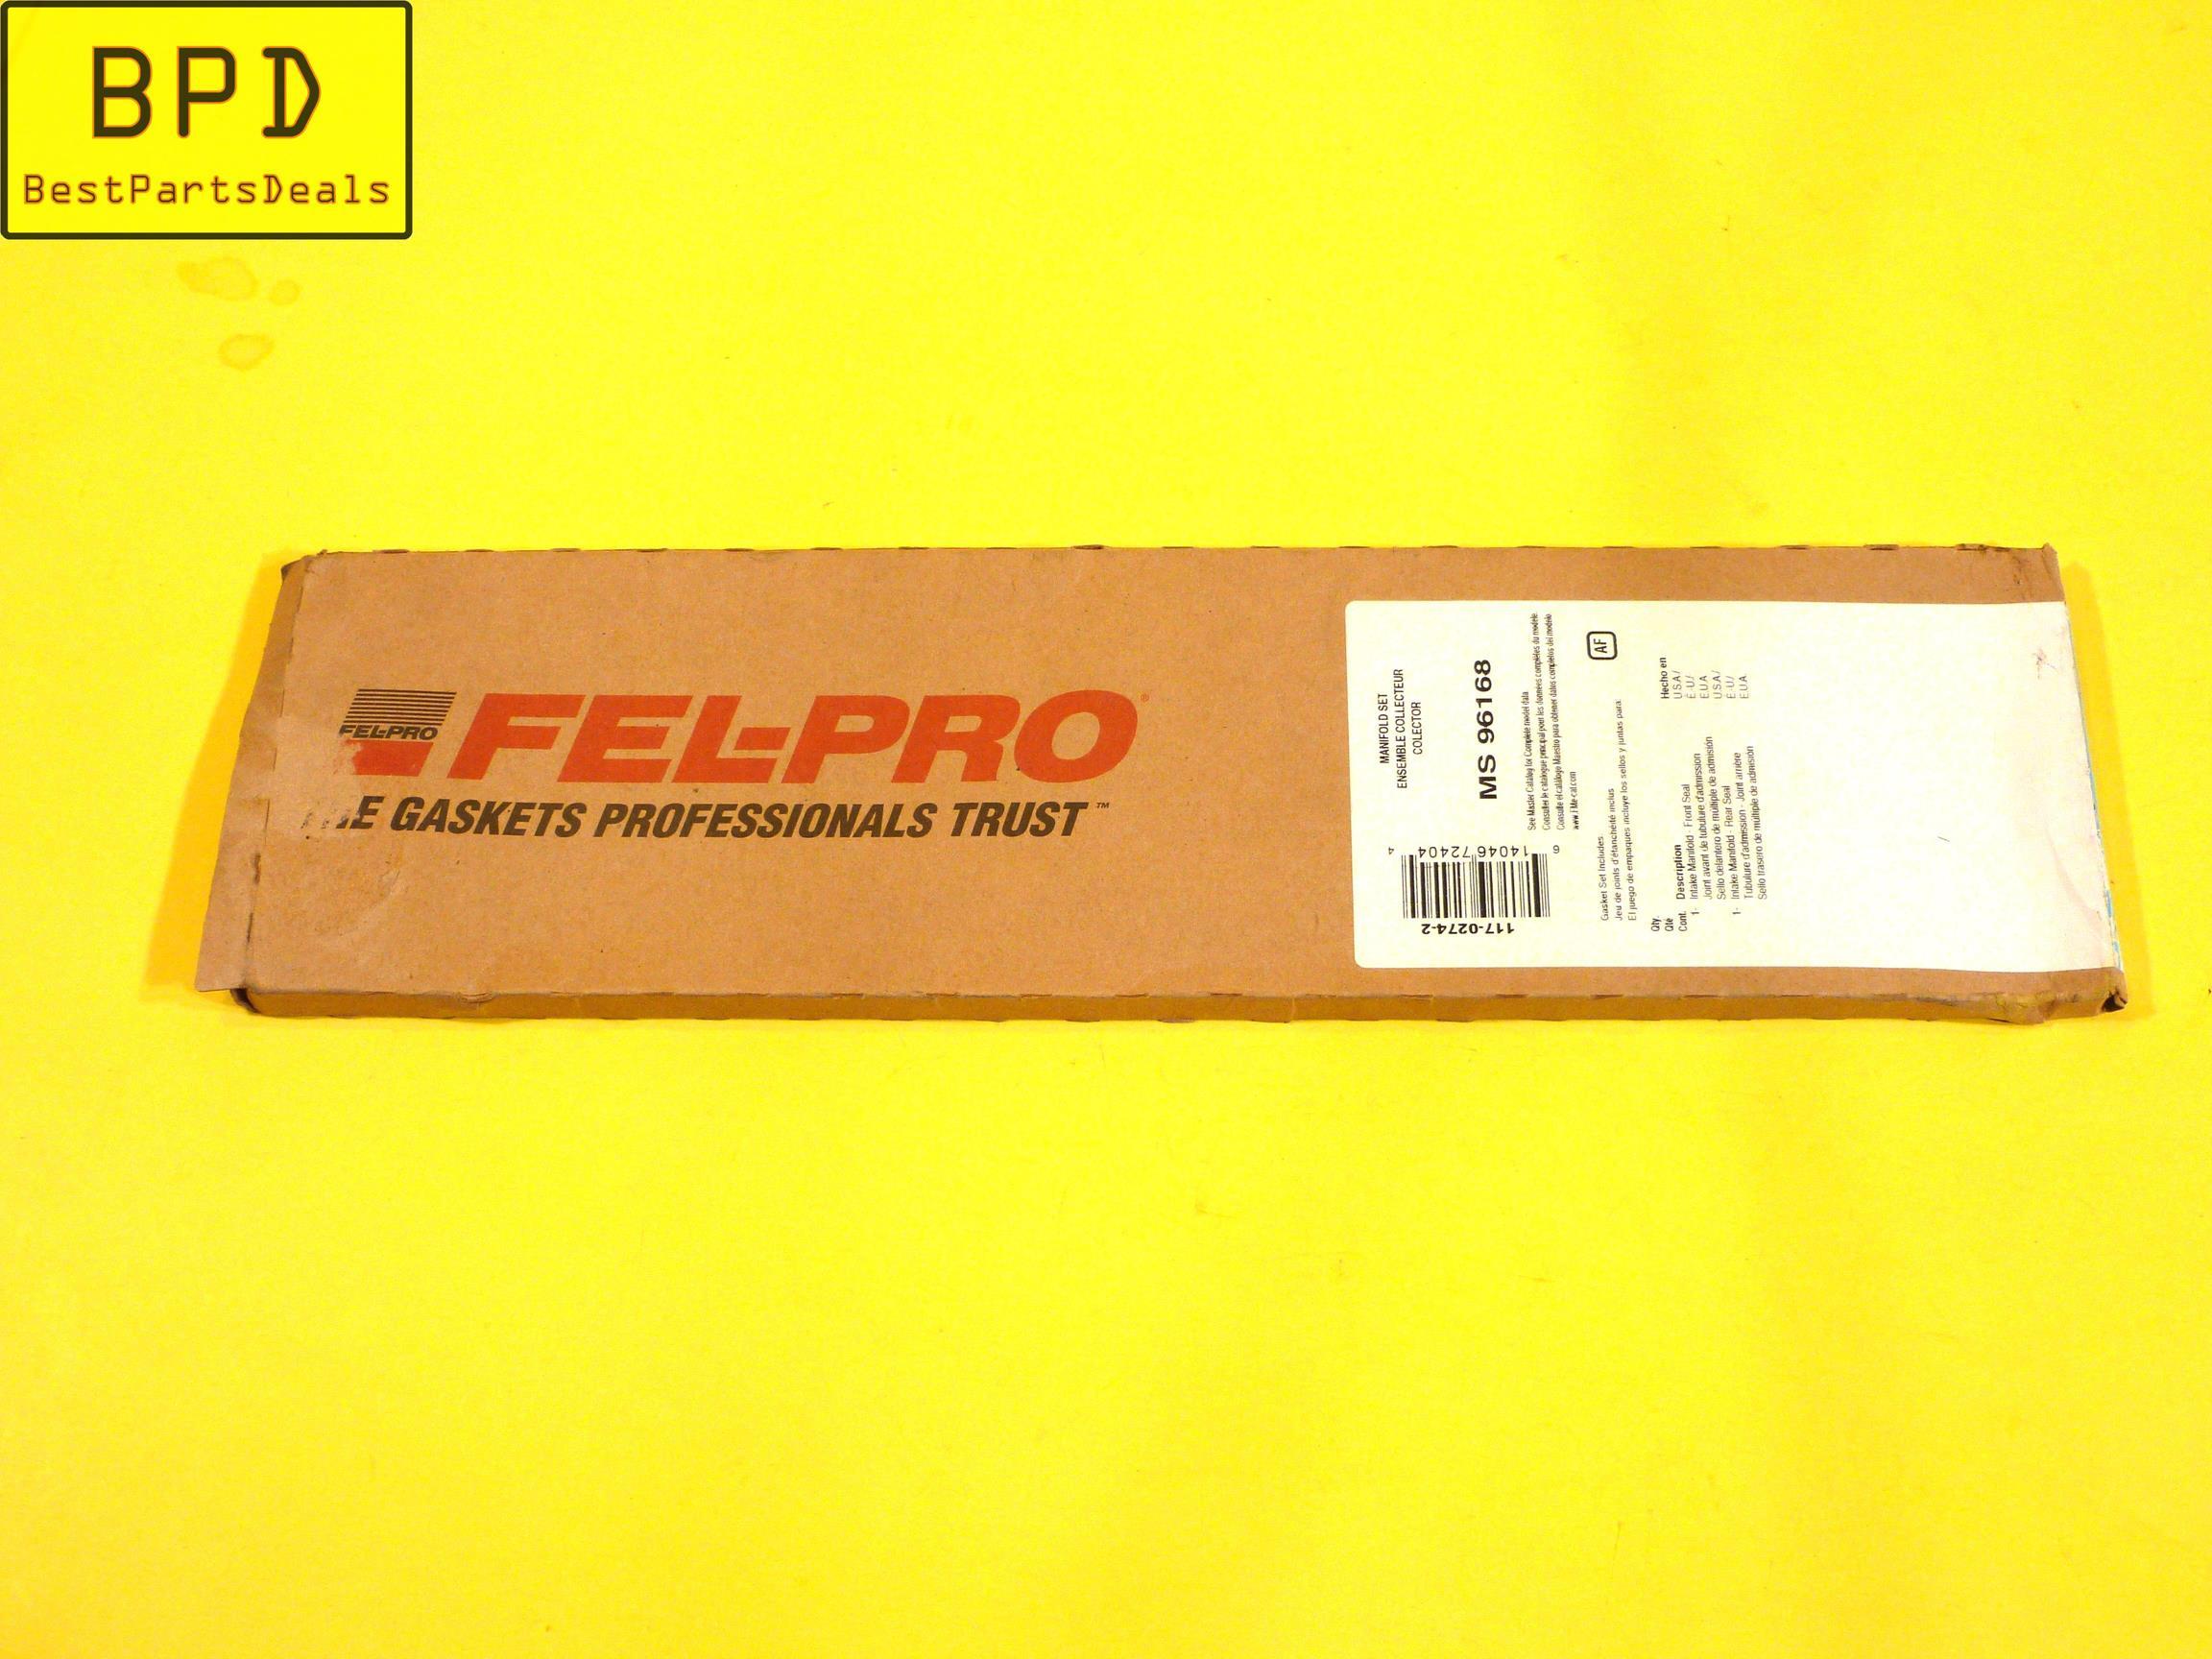 97-02 Acura Honda 3.0L V6 SOHC Intake Manifold Gasket Set FEL-PRO MS 96168